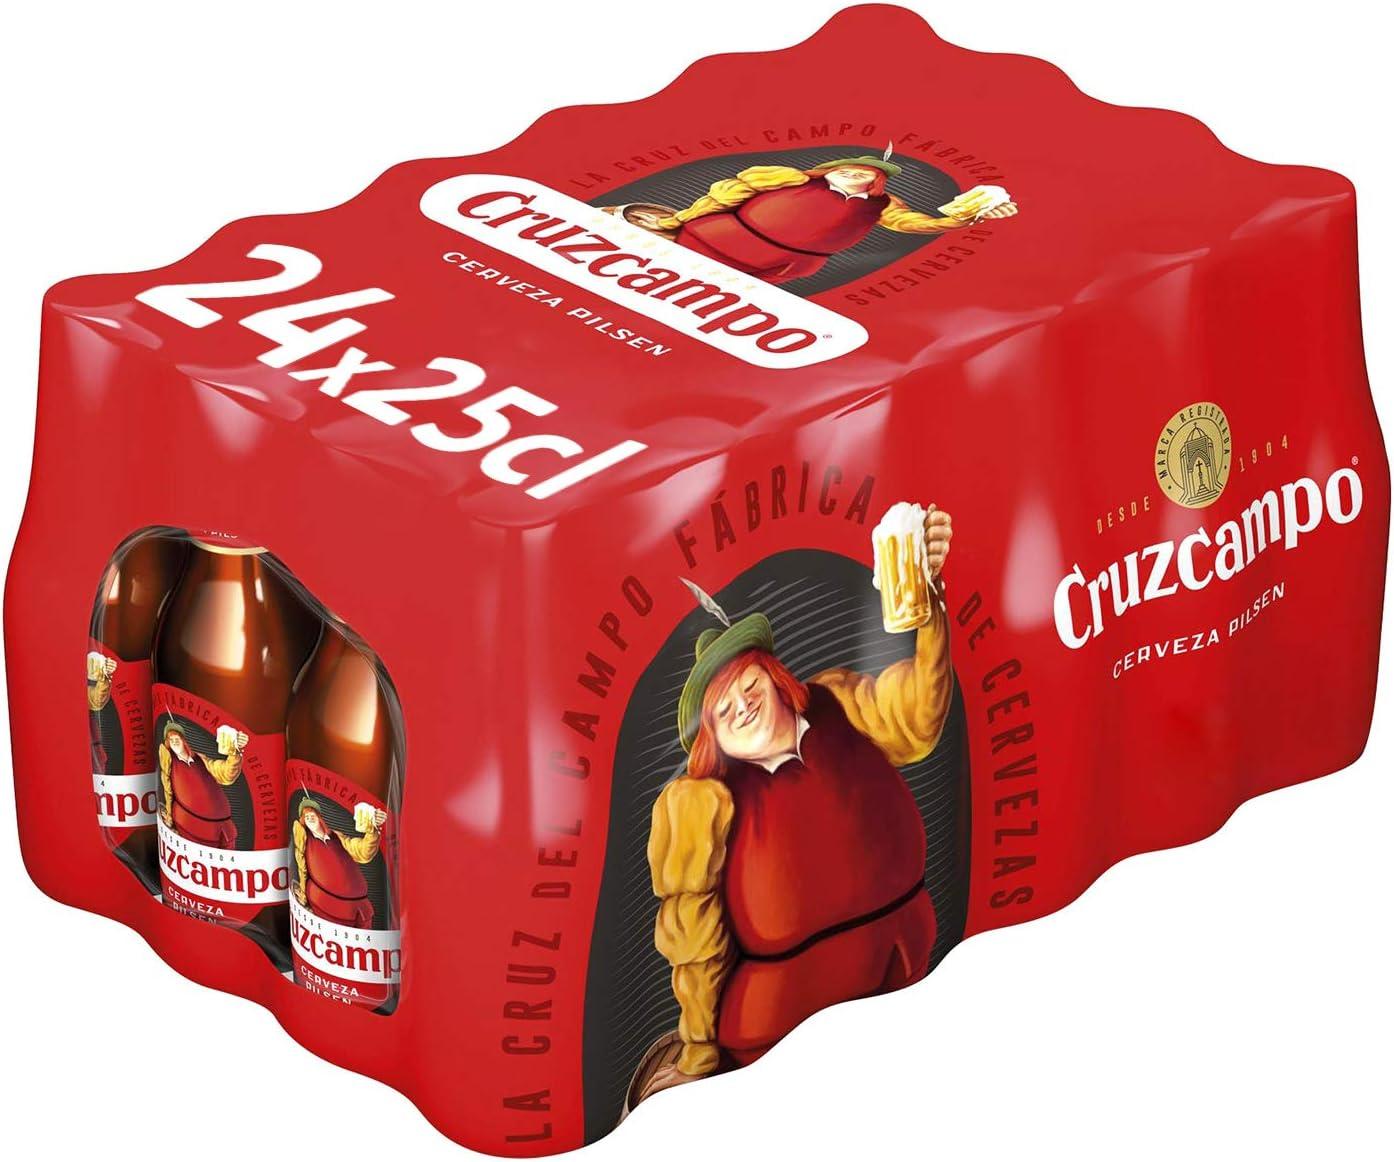 Cruzcampo Cerveza Pilsen - Caja de 24 Botellas x 250 ml - Total: 6 ...